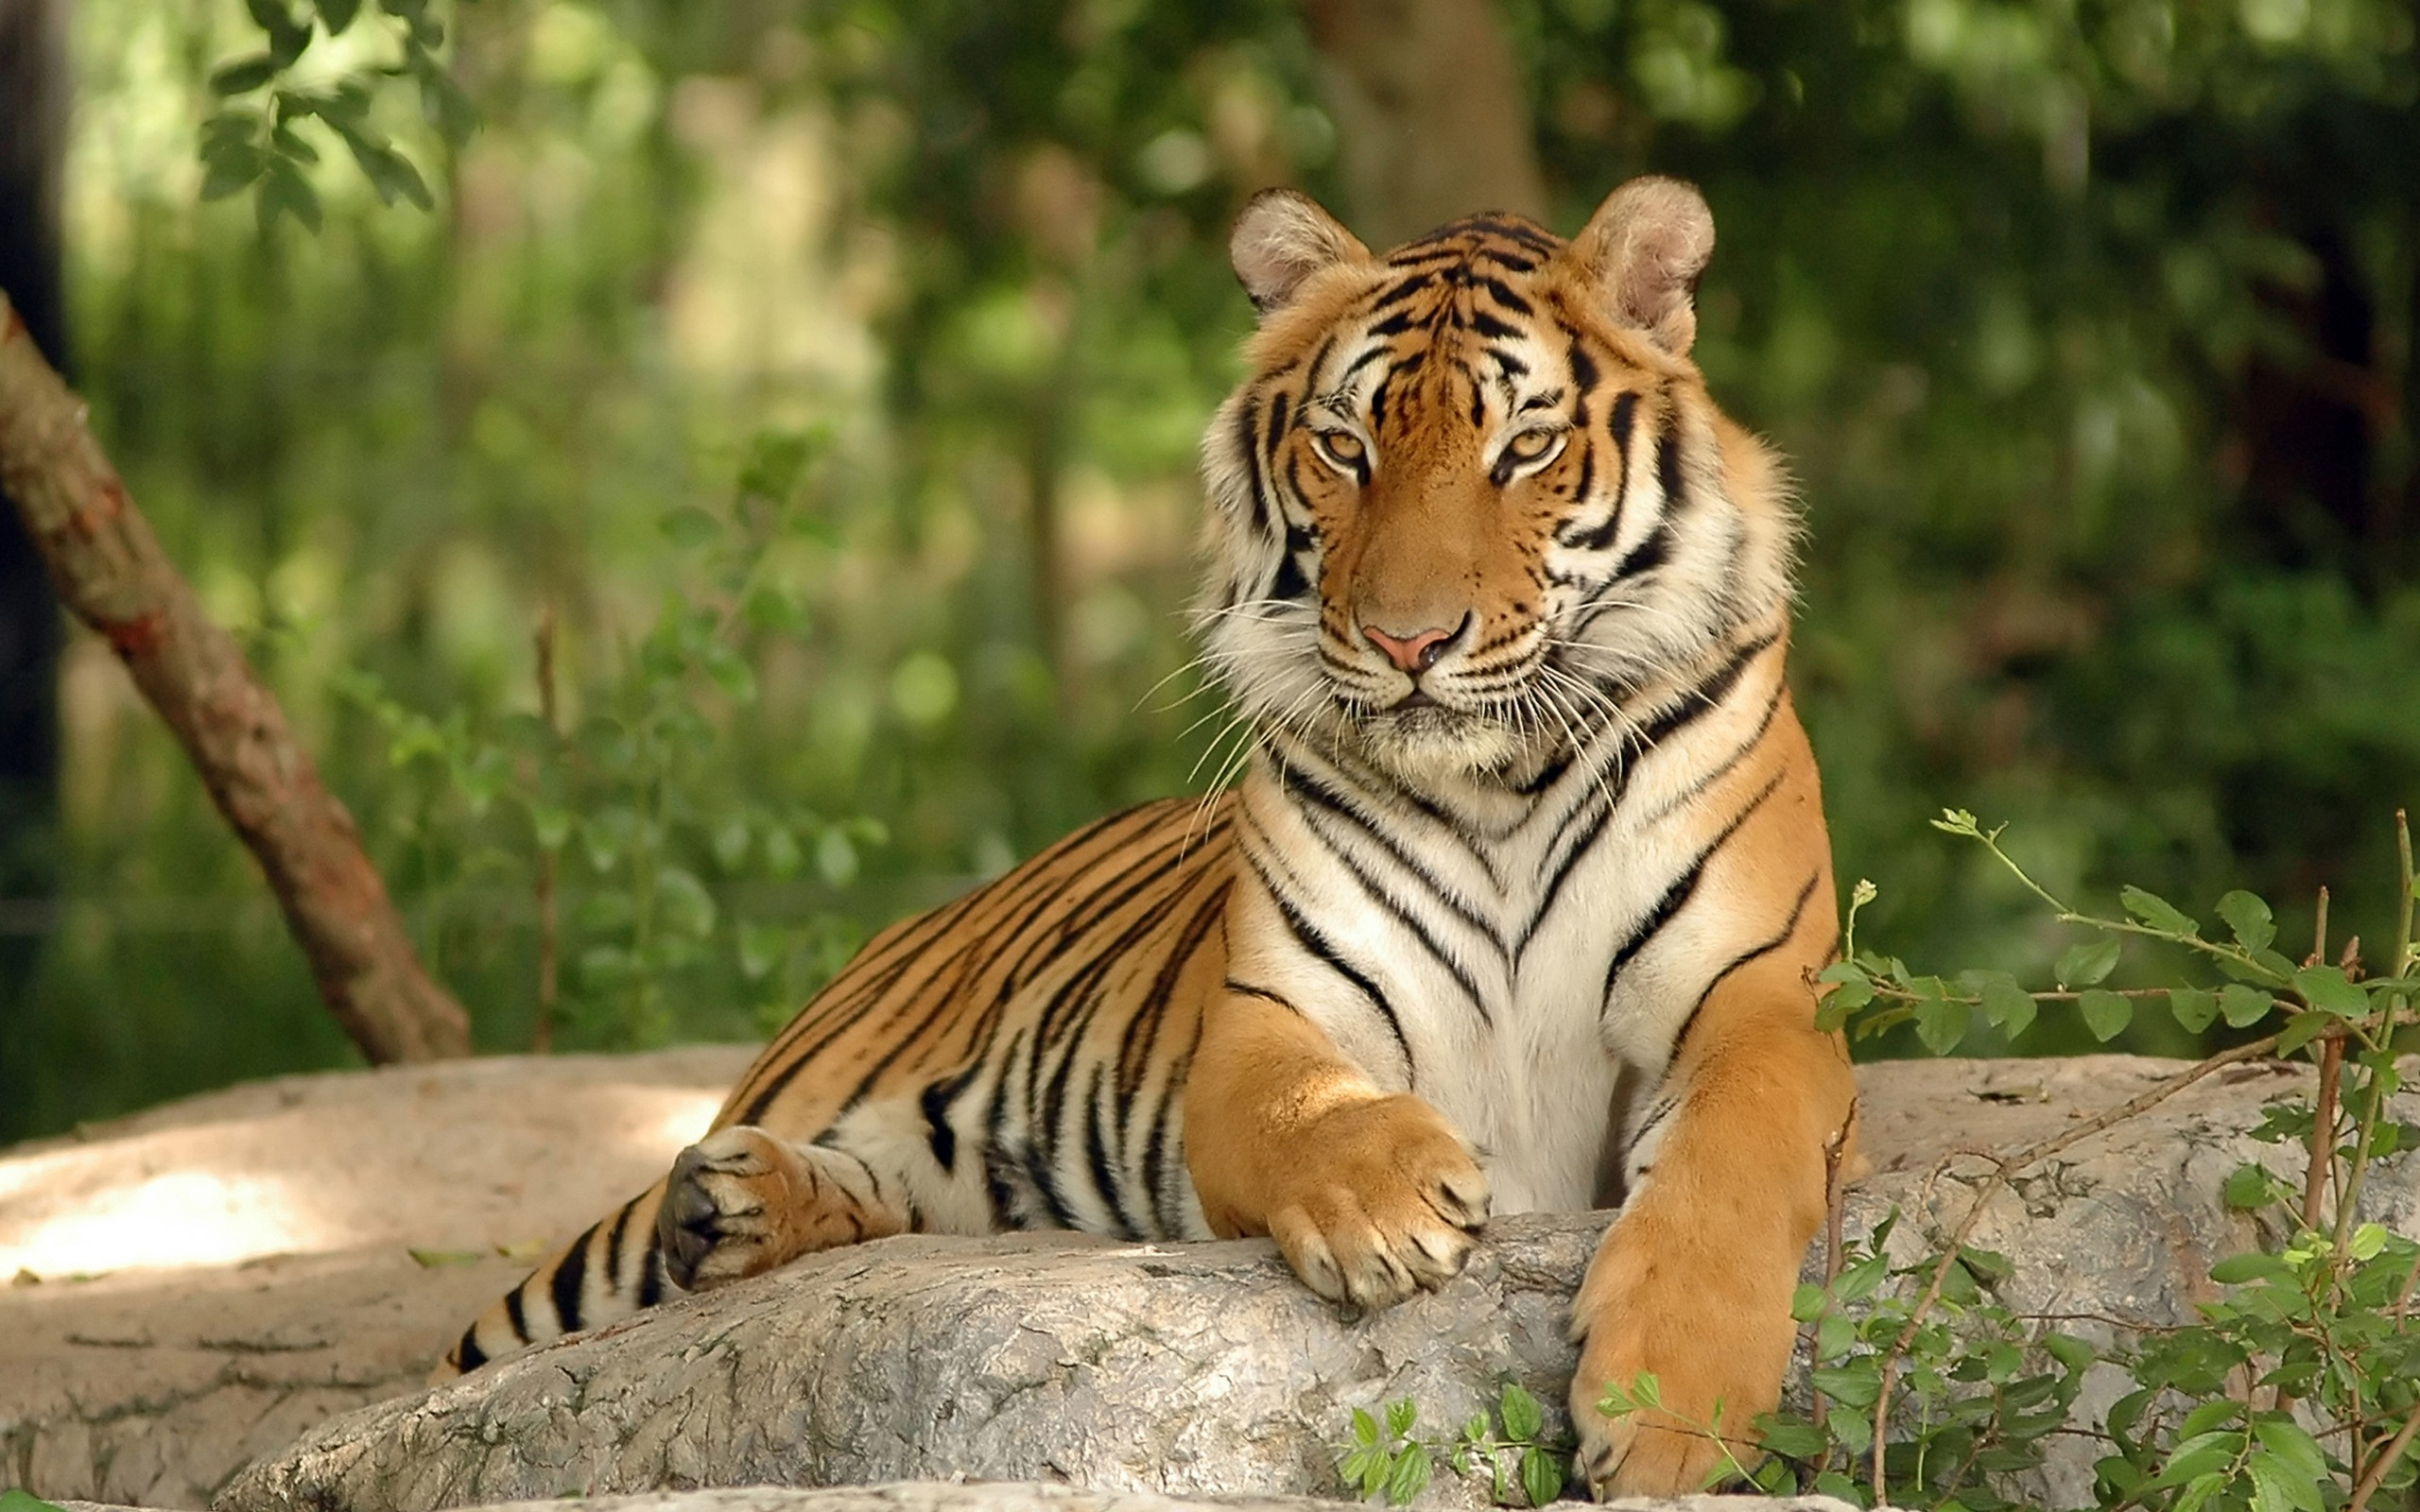 тигр, животное, хищник